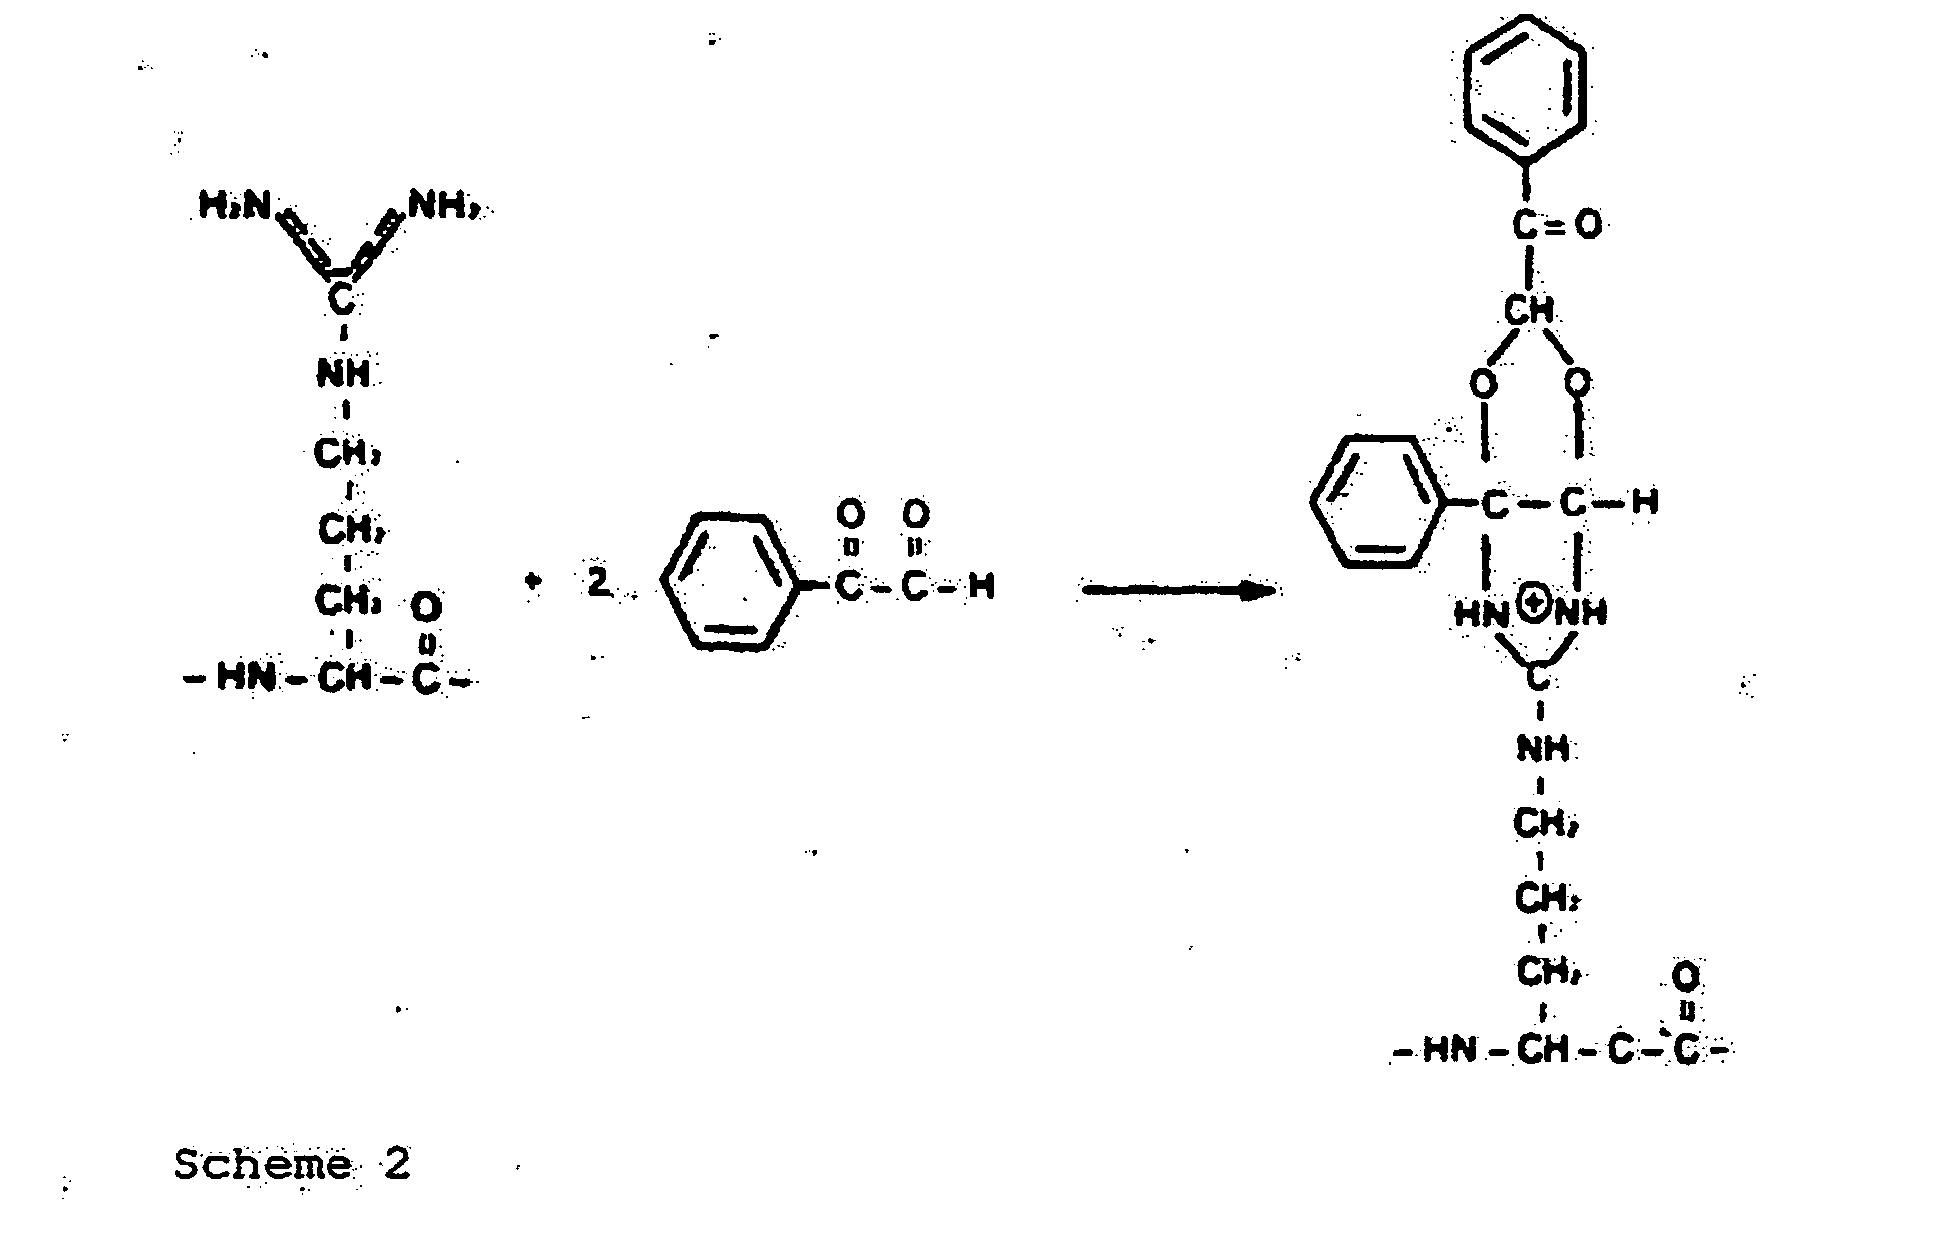 Phenylglyoxal